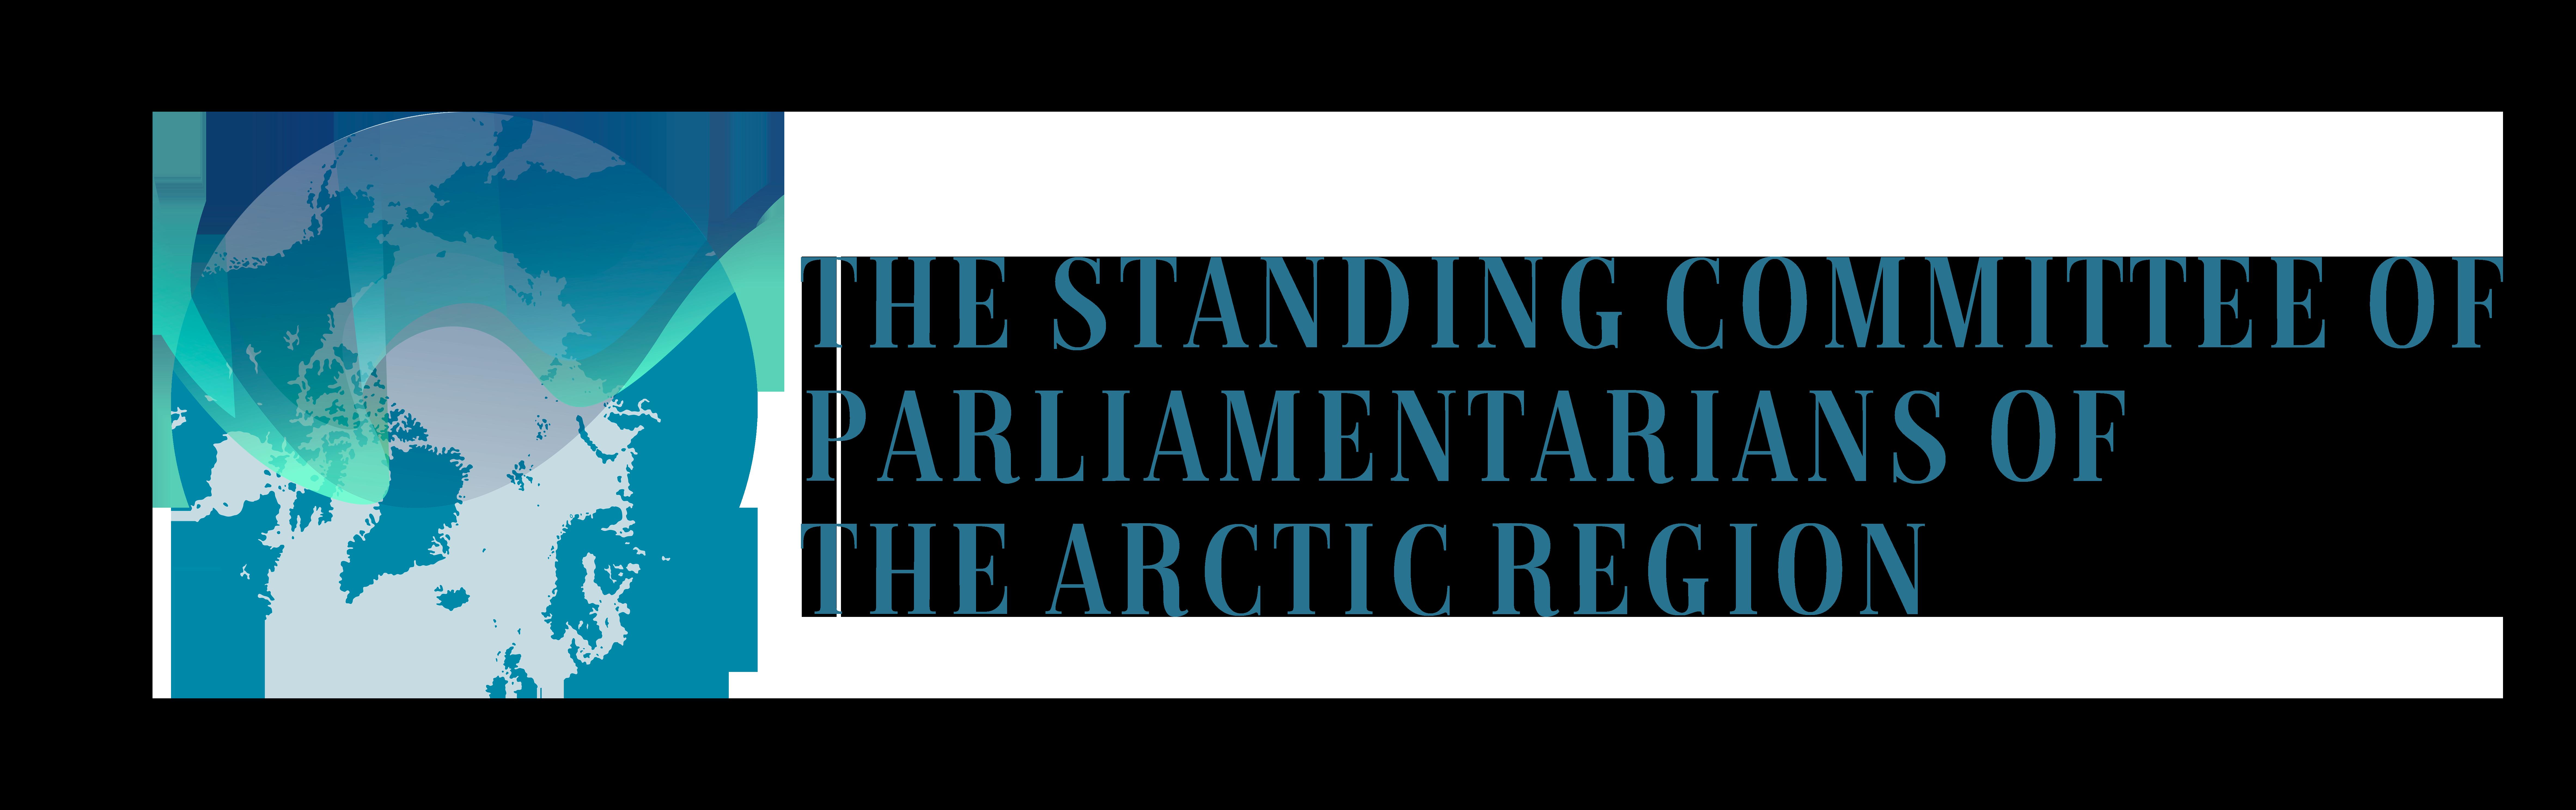 CPAR - Conference of Arctic Parlamentarians